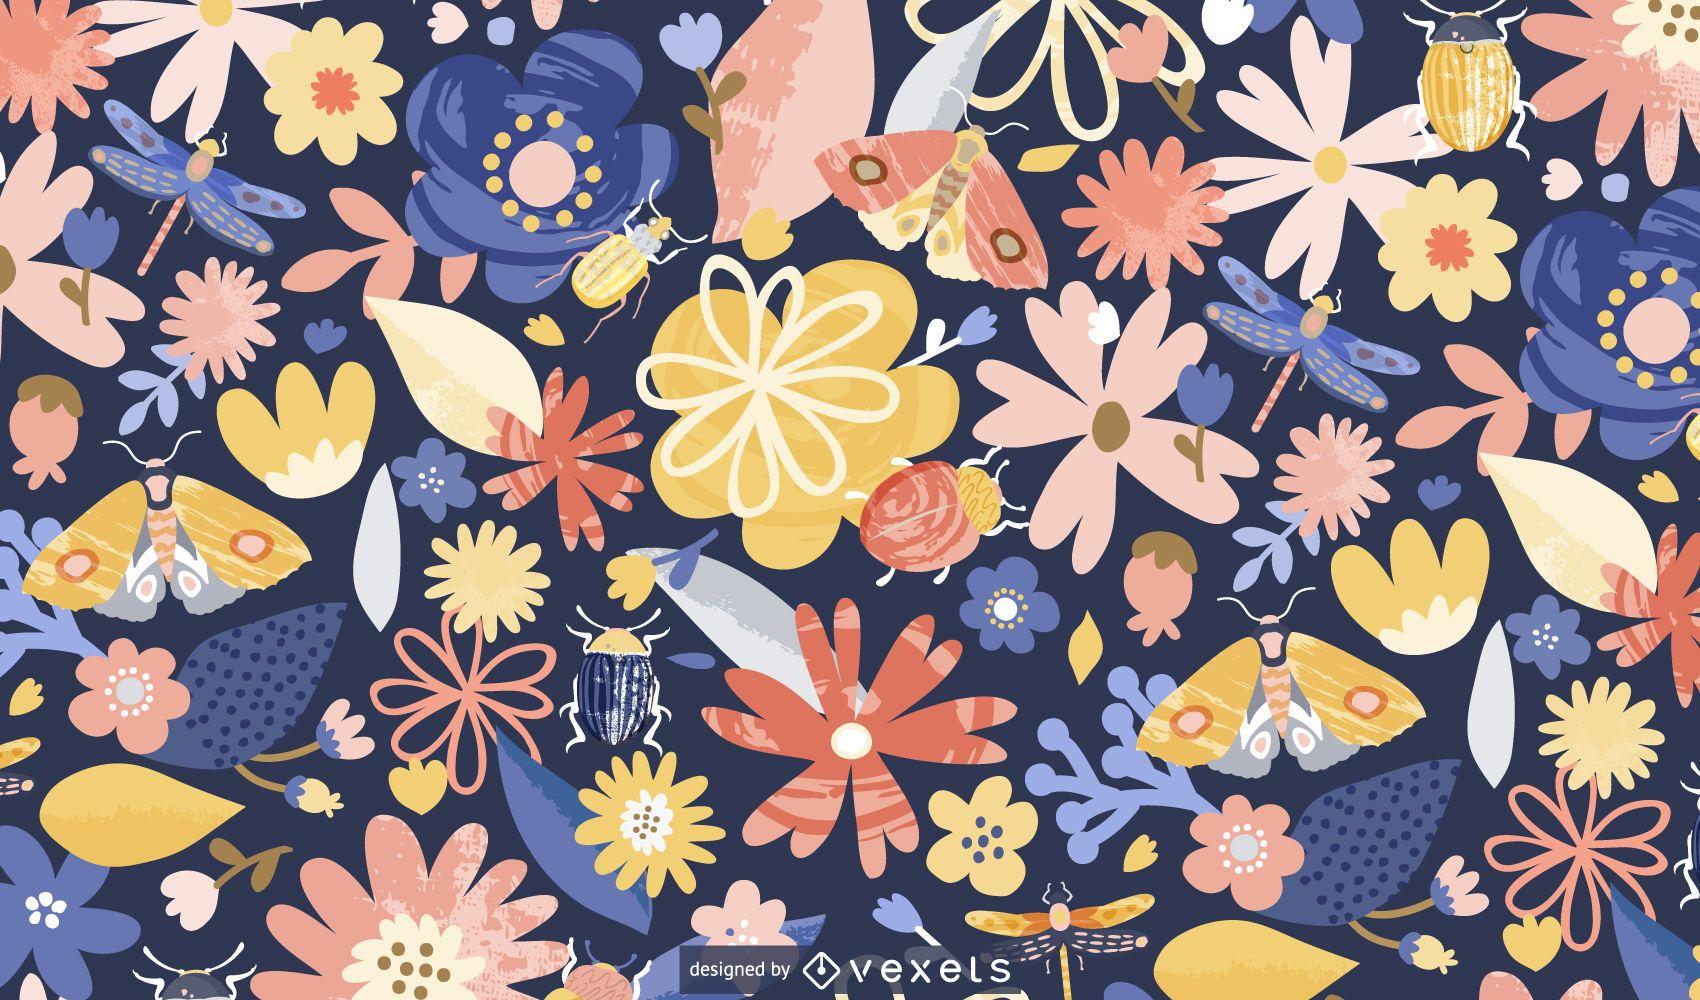 Springtime flowers pattern design